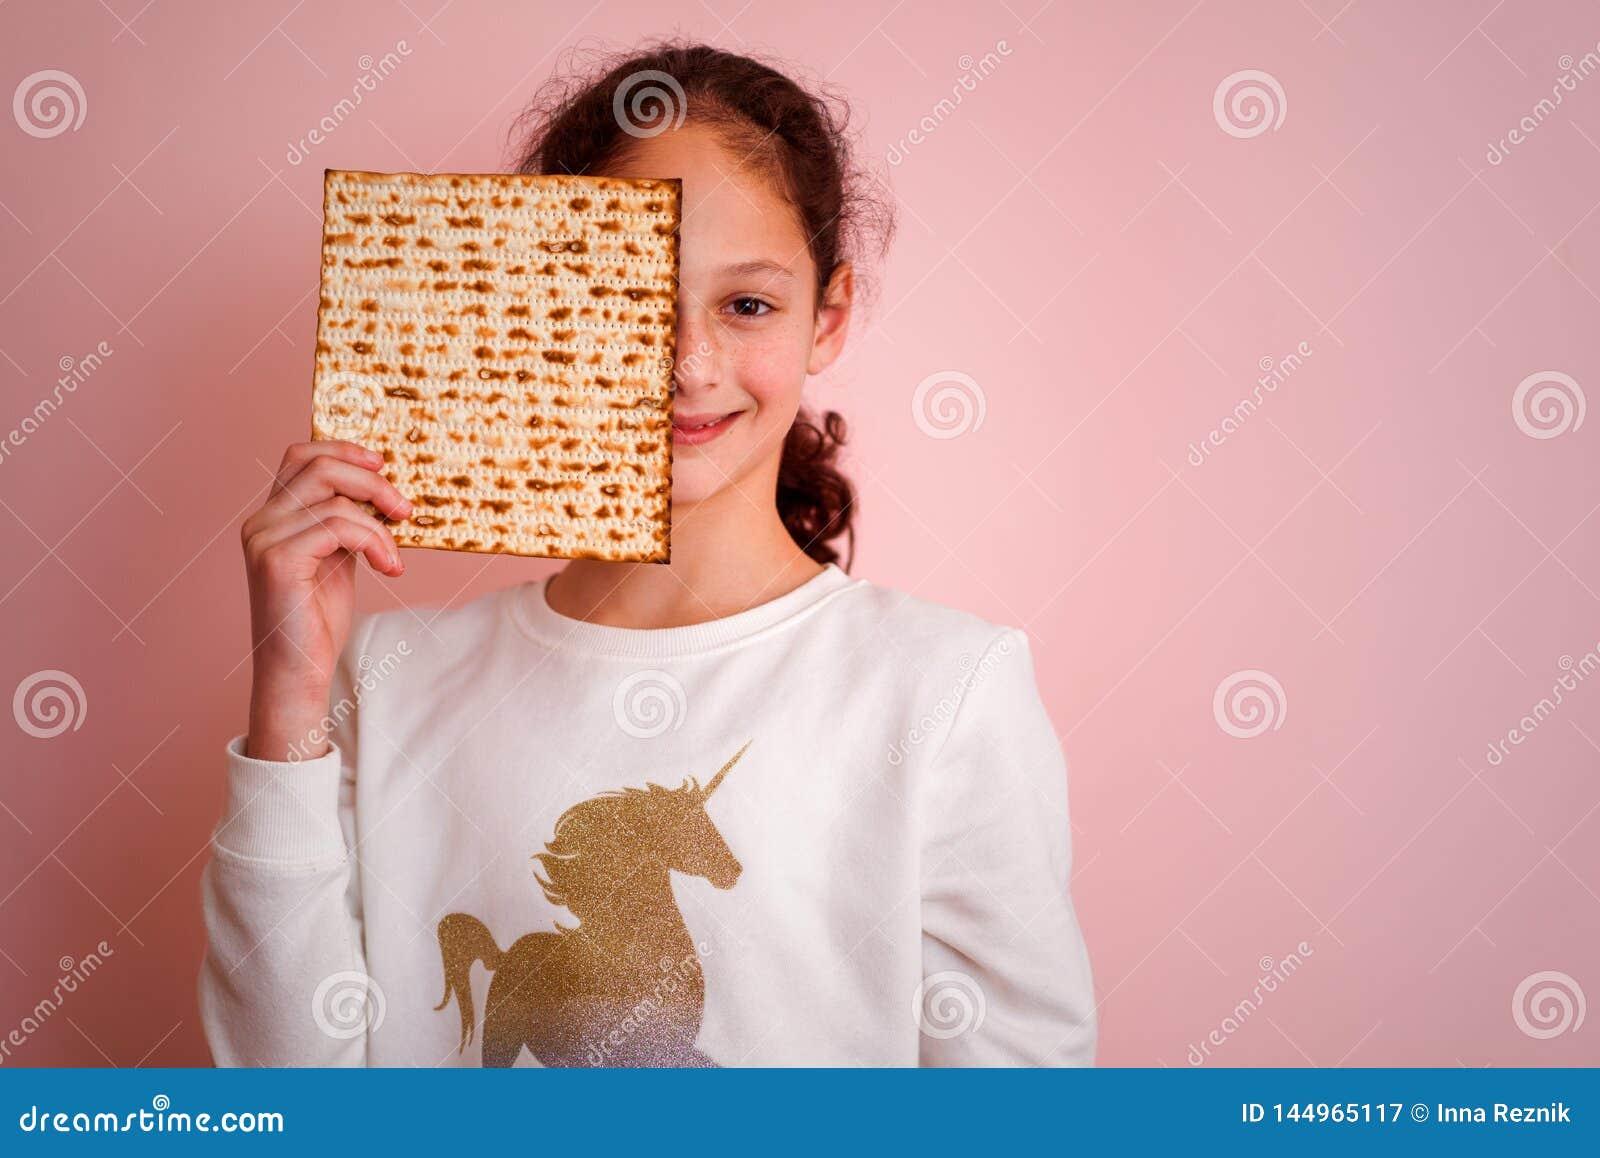 Matzah ou matza da terra arrendada da mo?a Convite ou cart?o judaico da p?scoa judaica dos feriados Foco seletivo Copie o espa?o